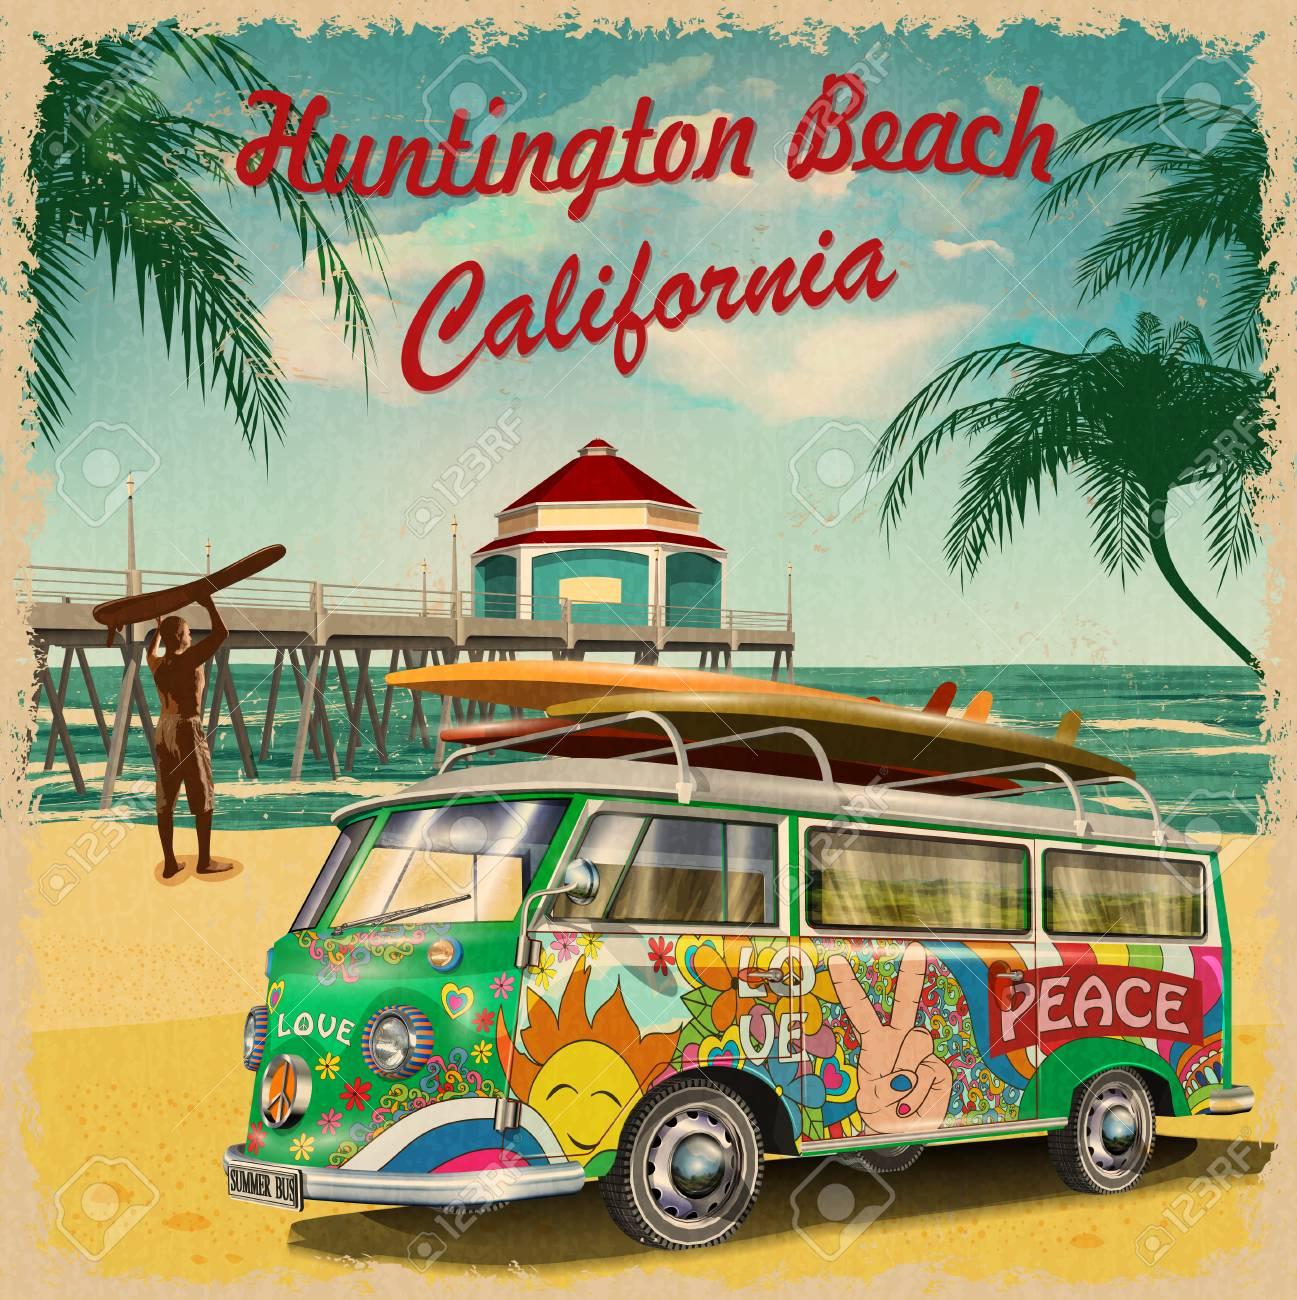 Huntington Beach,California retro poster. - 98412779